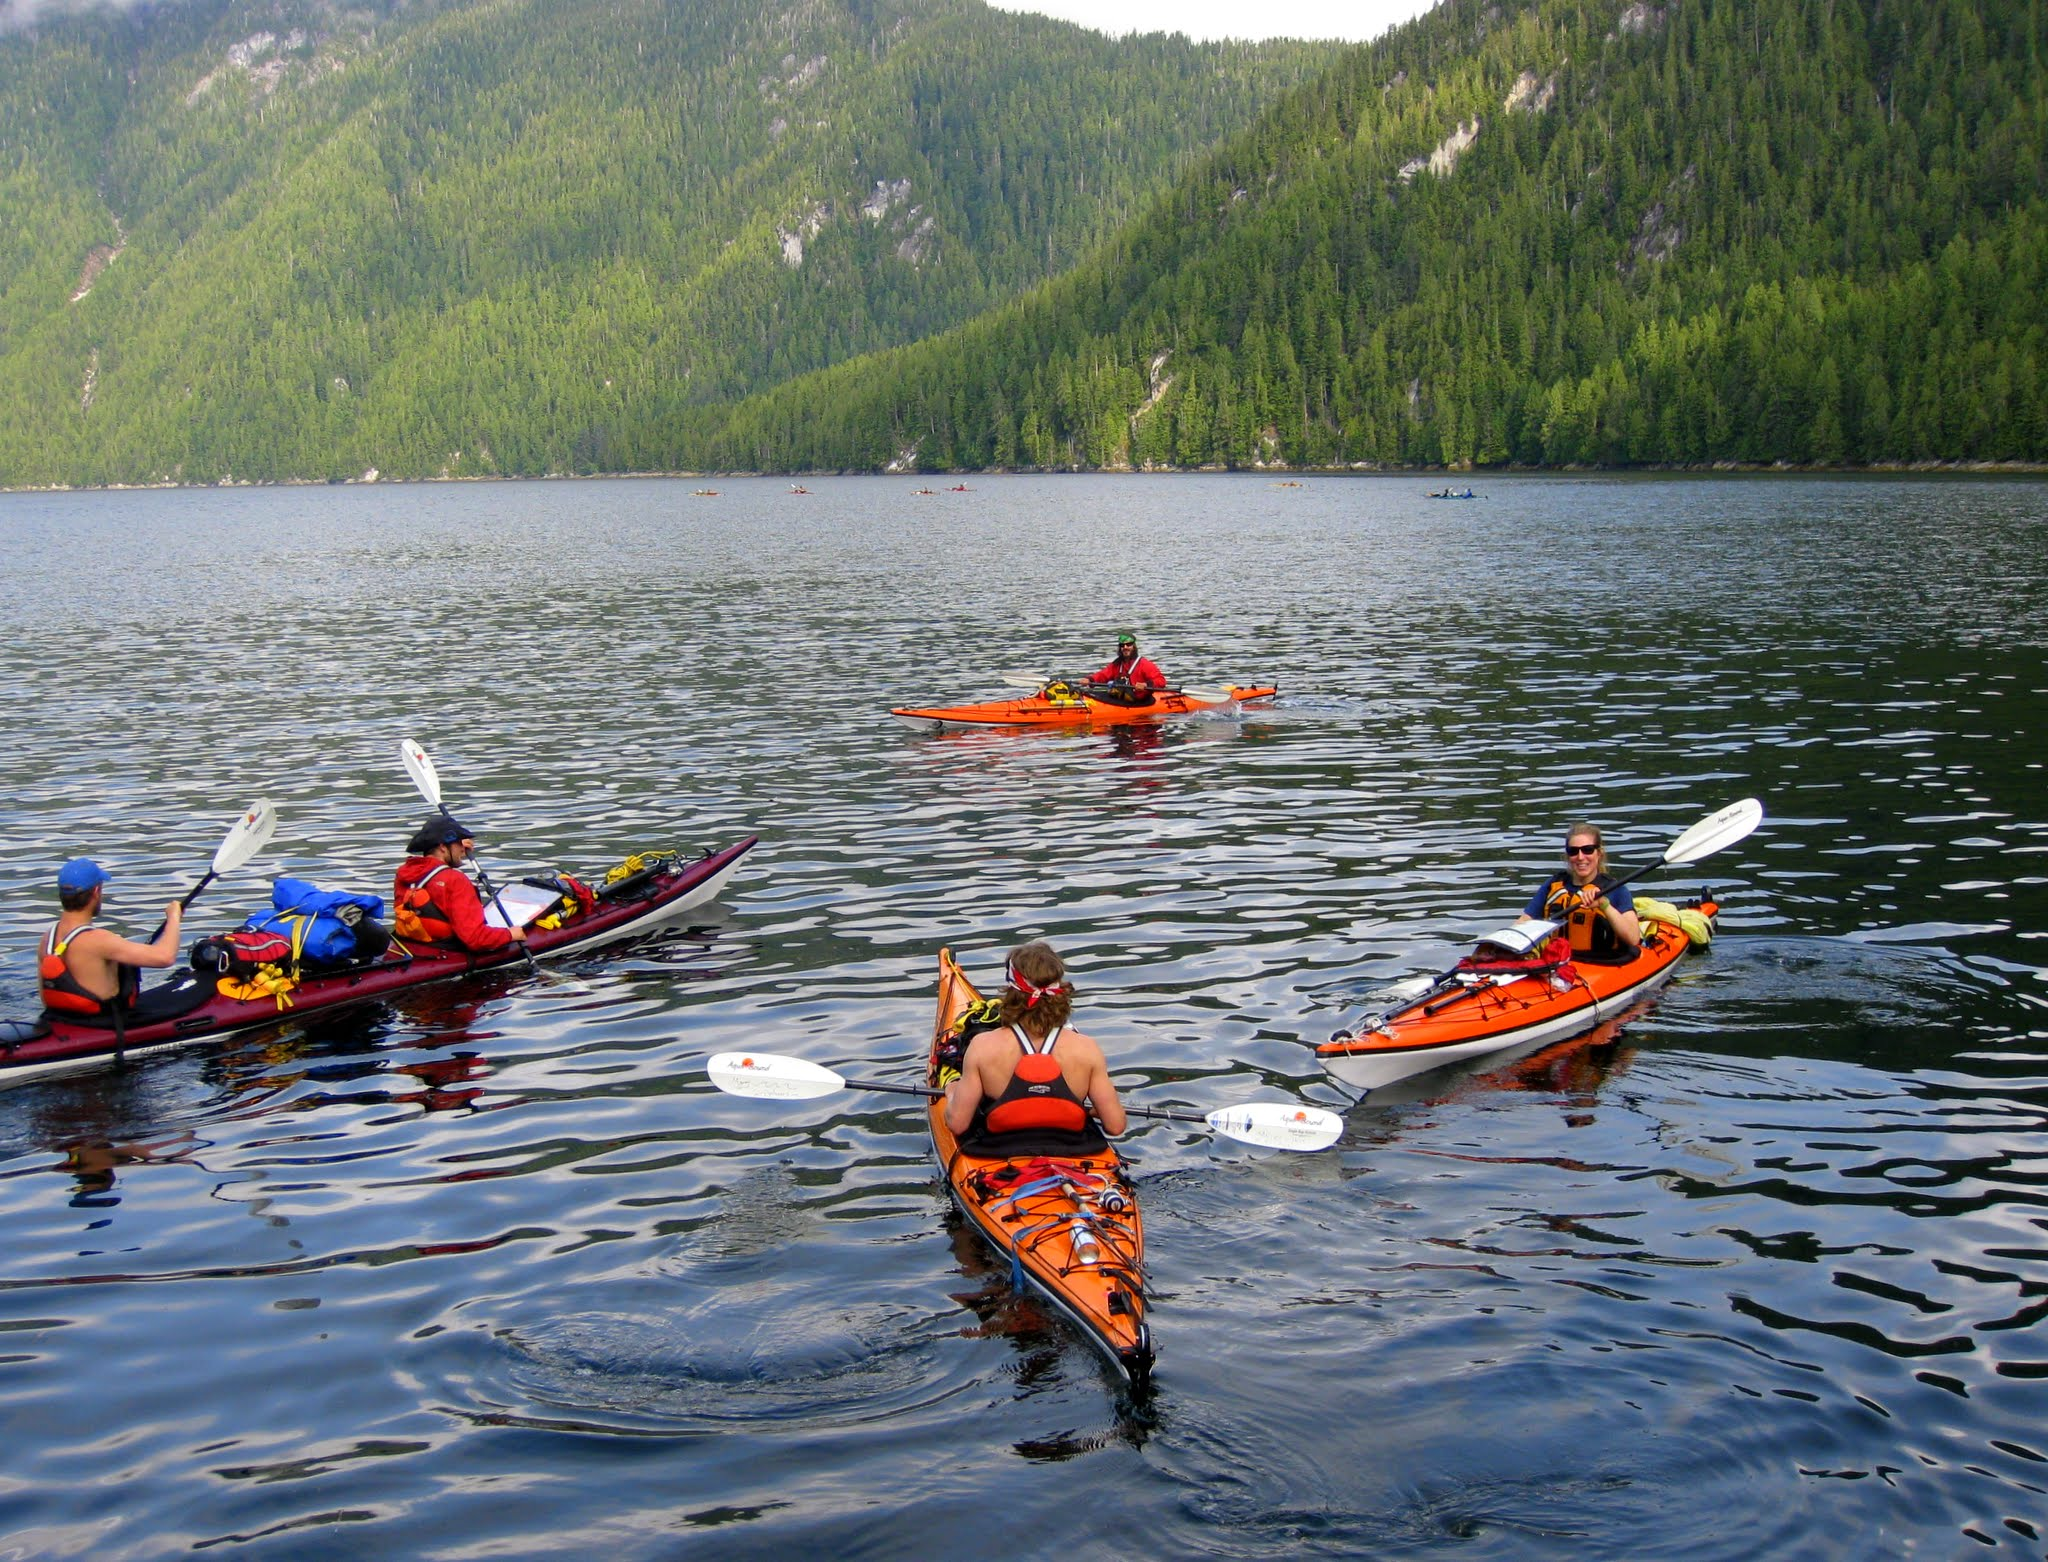 Junneau kayakers